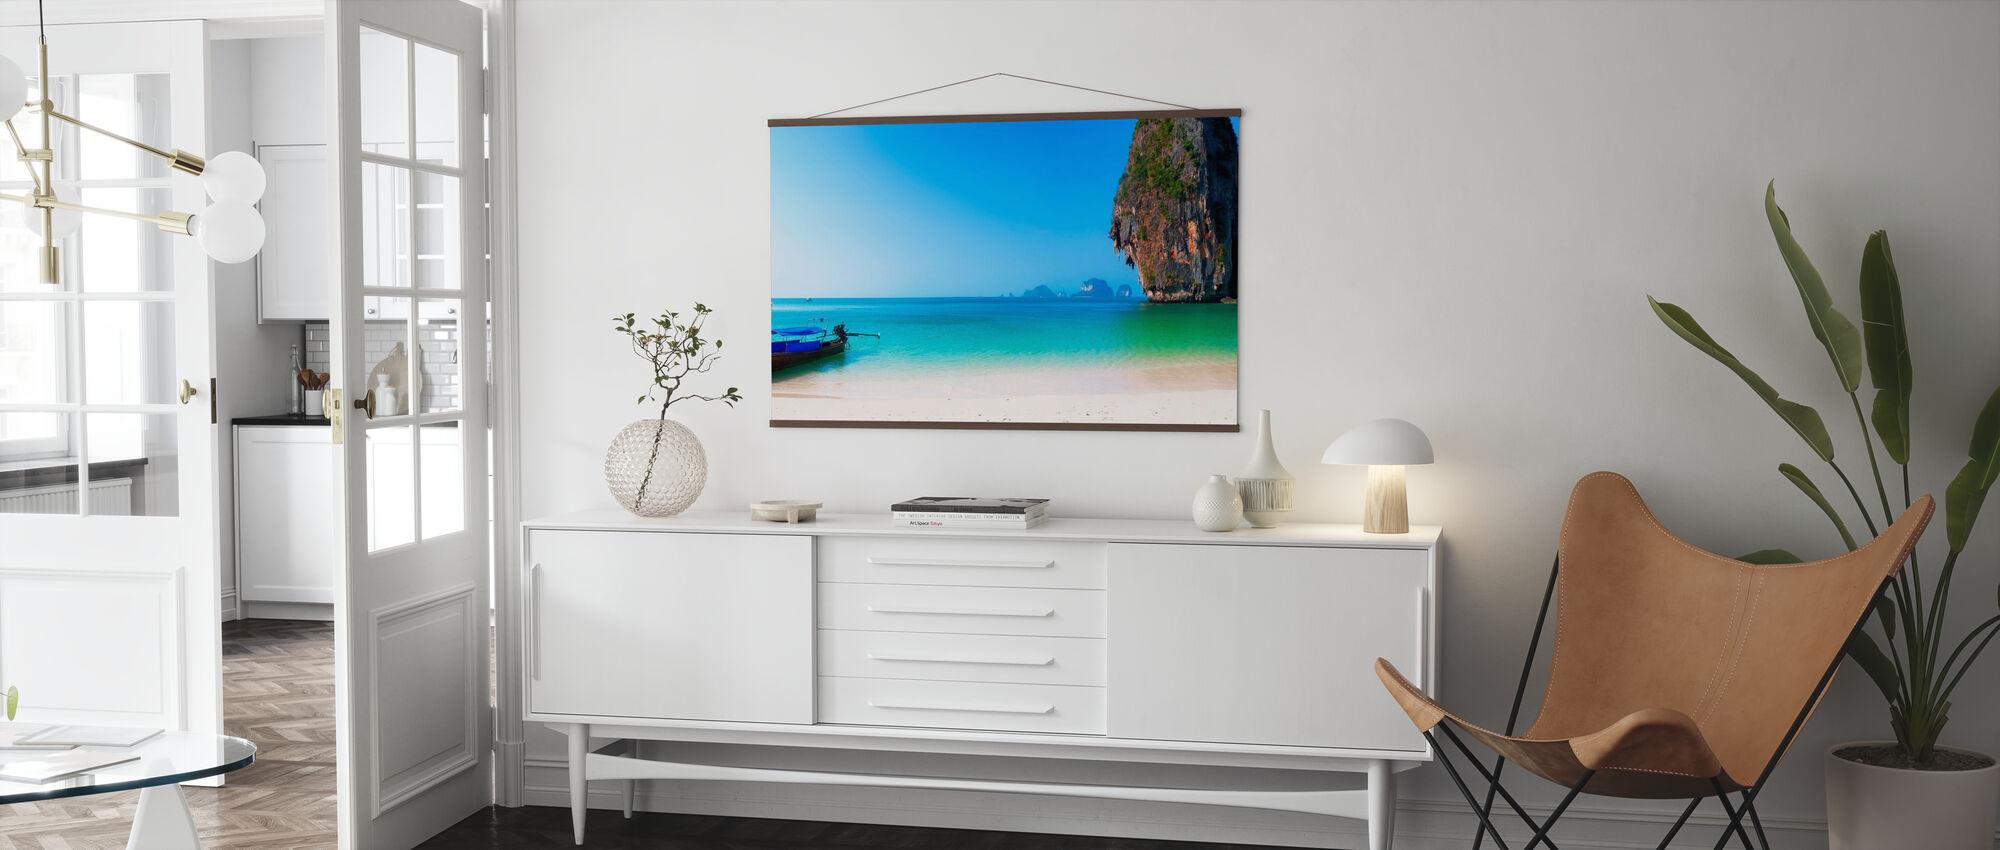 Thailand Island Beach - Poster - Living Room